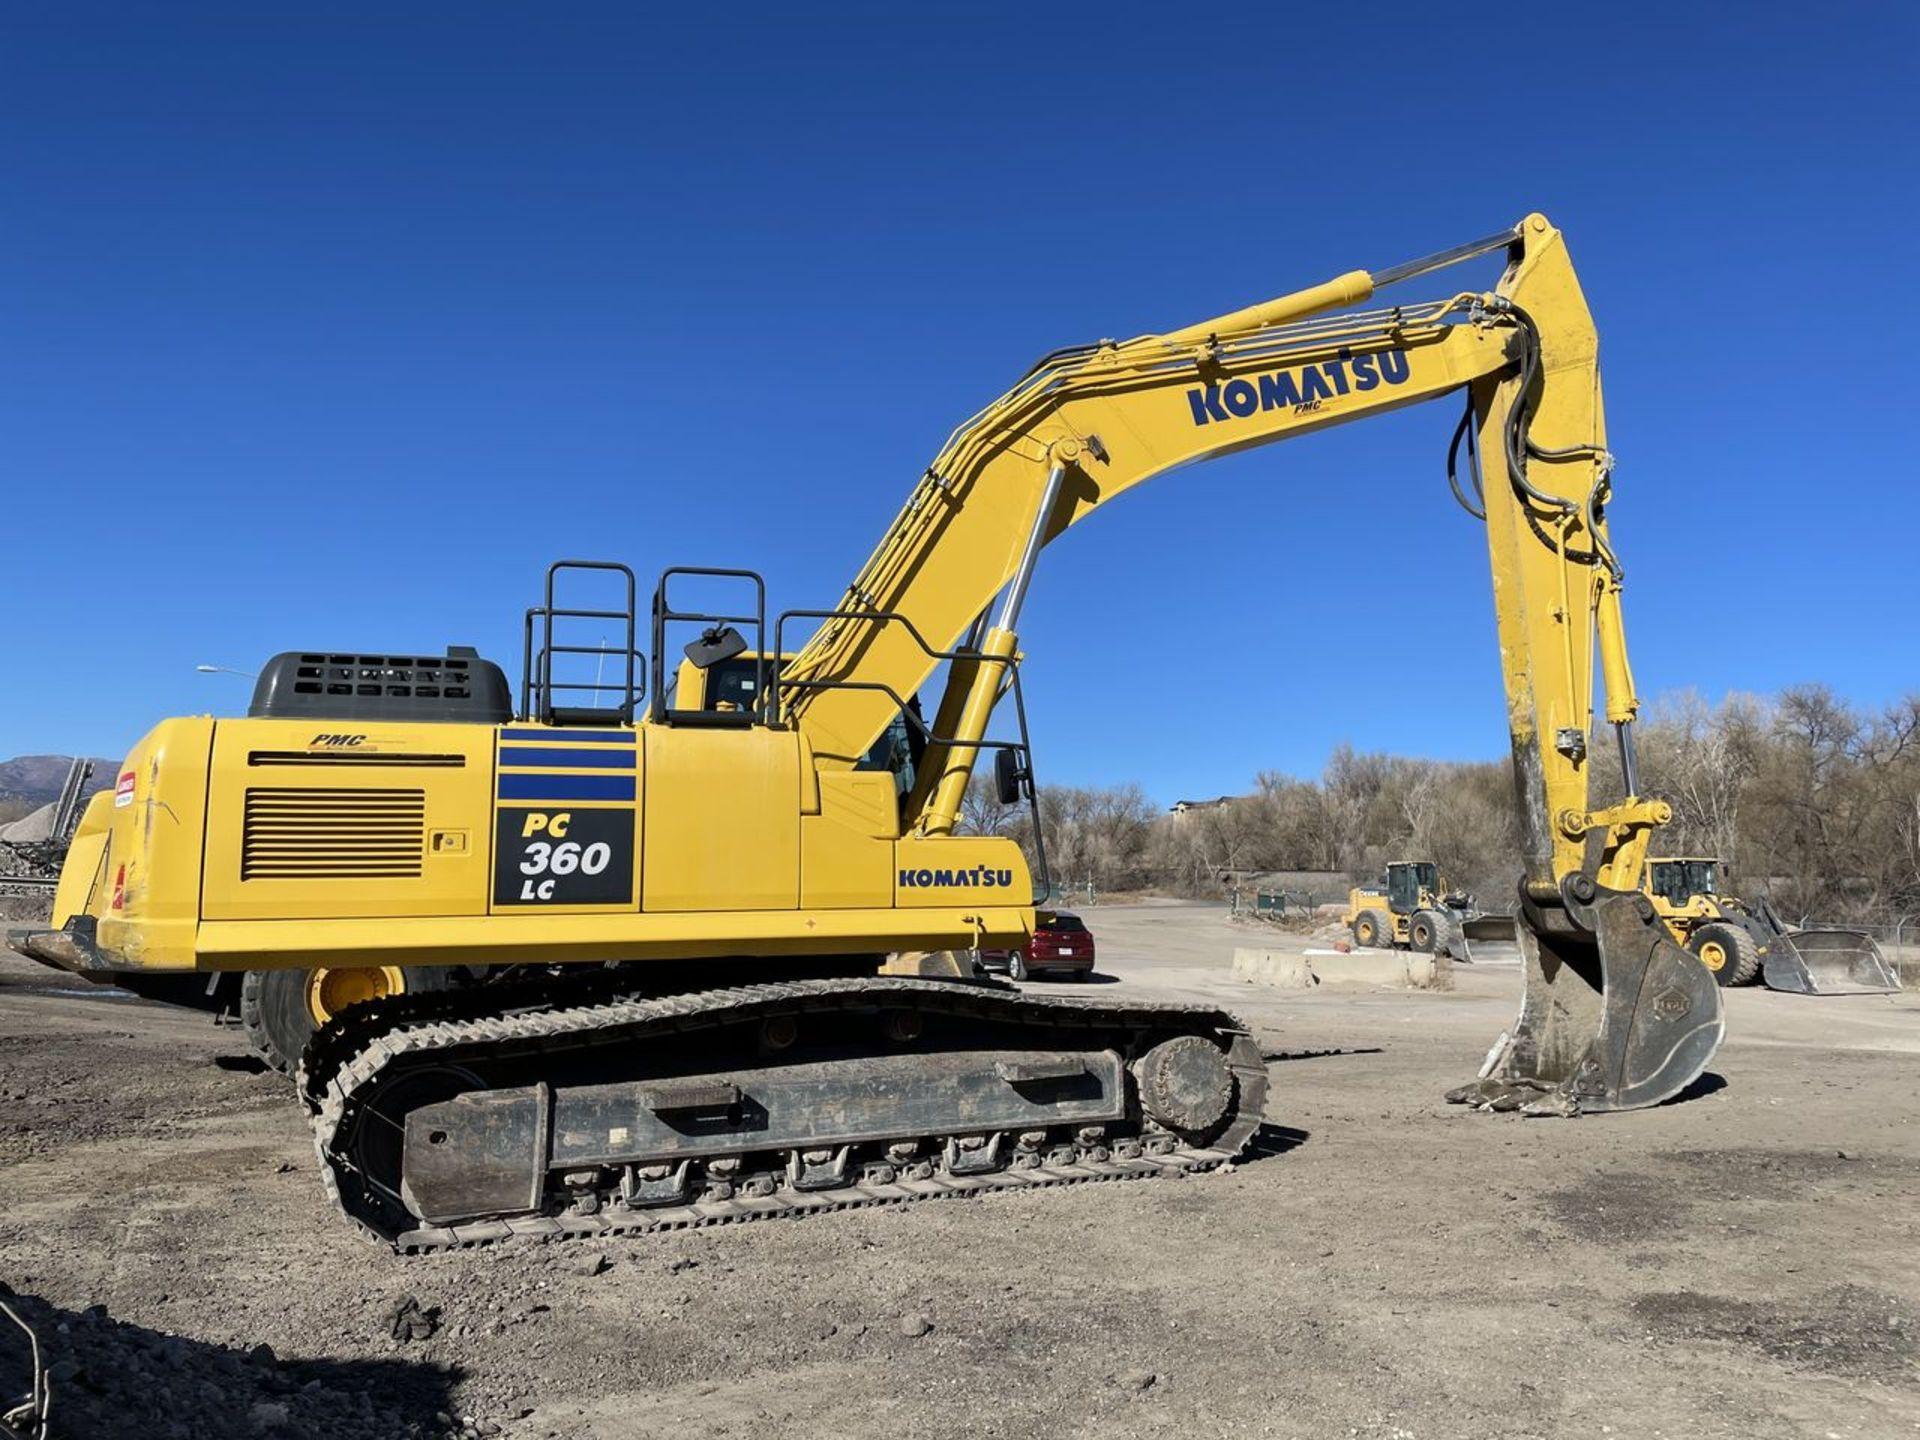 2018 Komatsu PC360LC-11 Hydraulic Crawler Excavator, S/N: A36863, PIN: KMTPC256CJWA36863; with 2,883 - Image 3 of 19